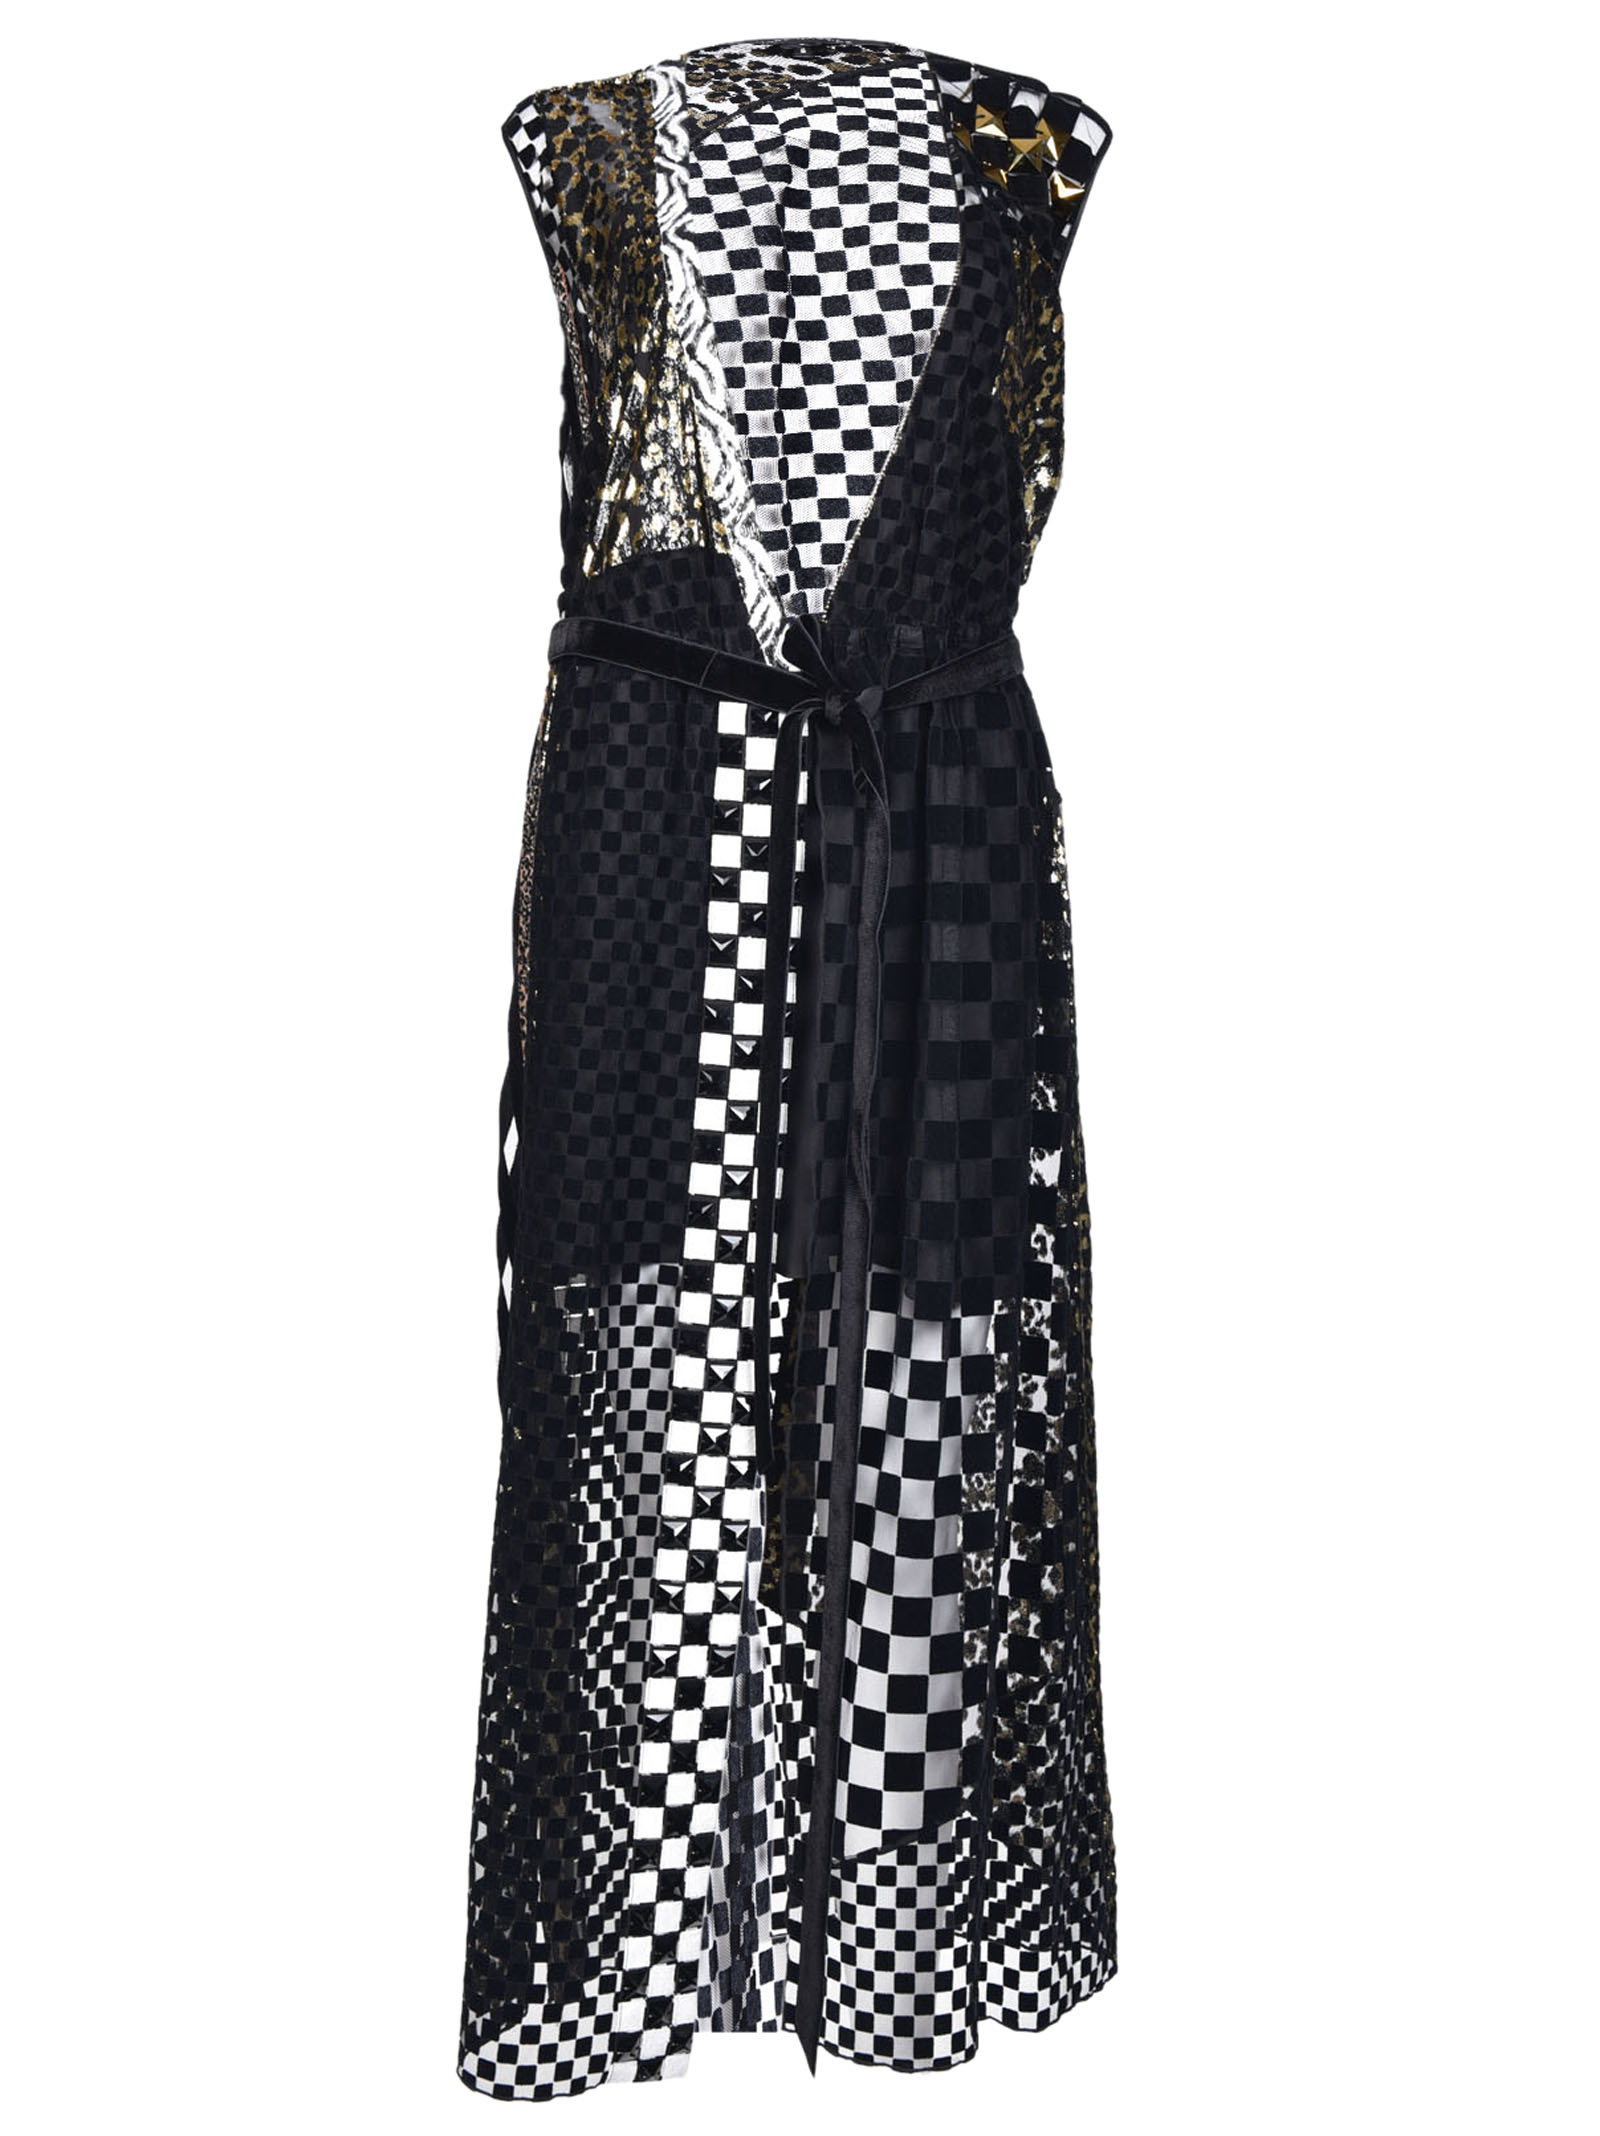 marc jacobs female marc jacobs studded dress